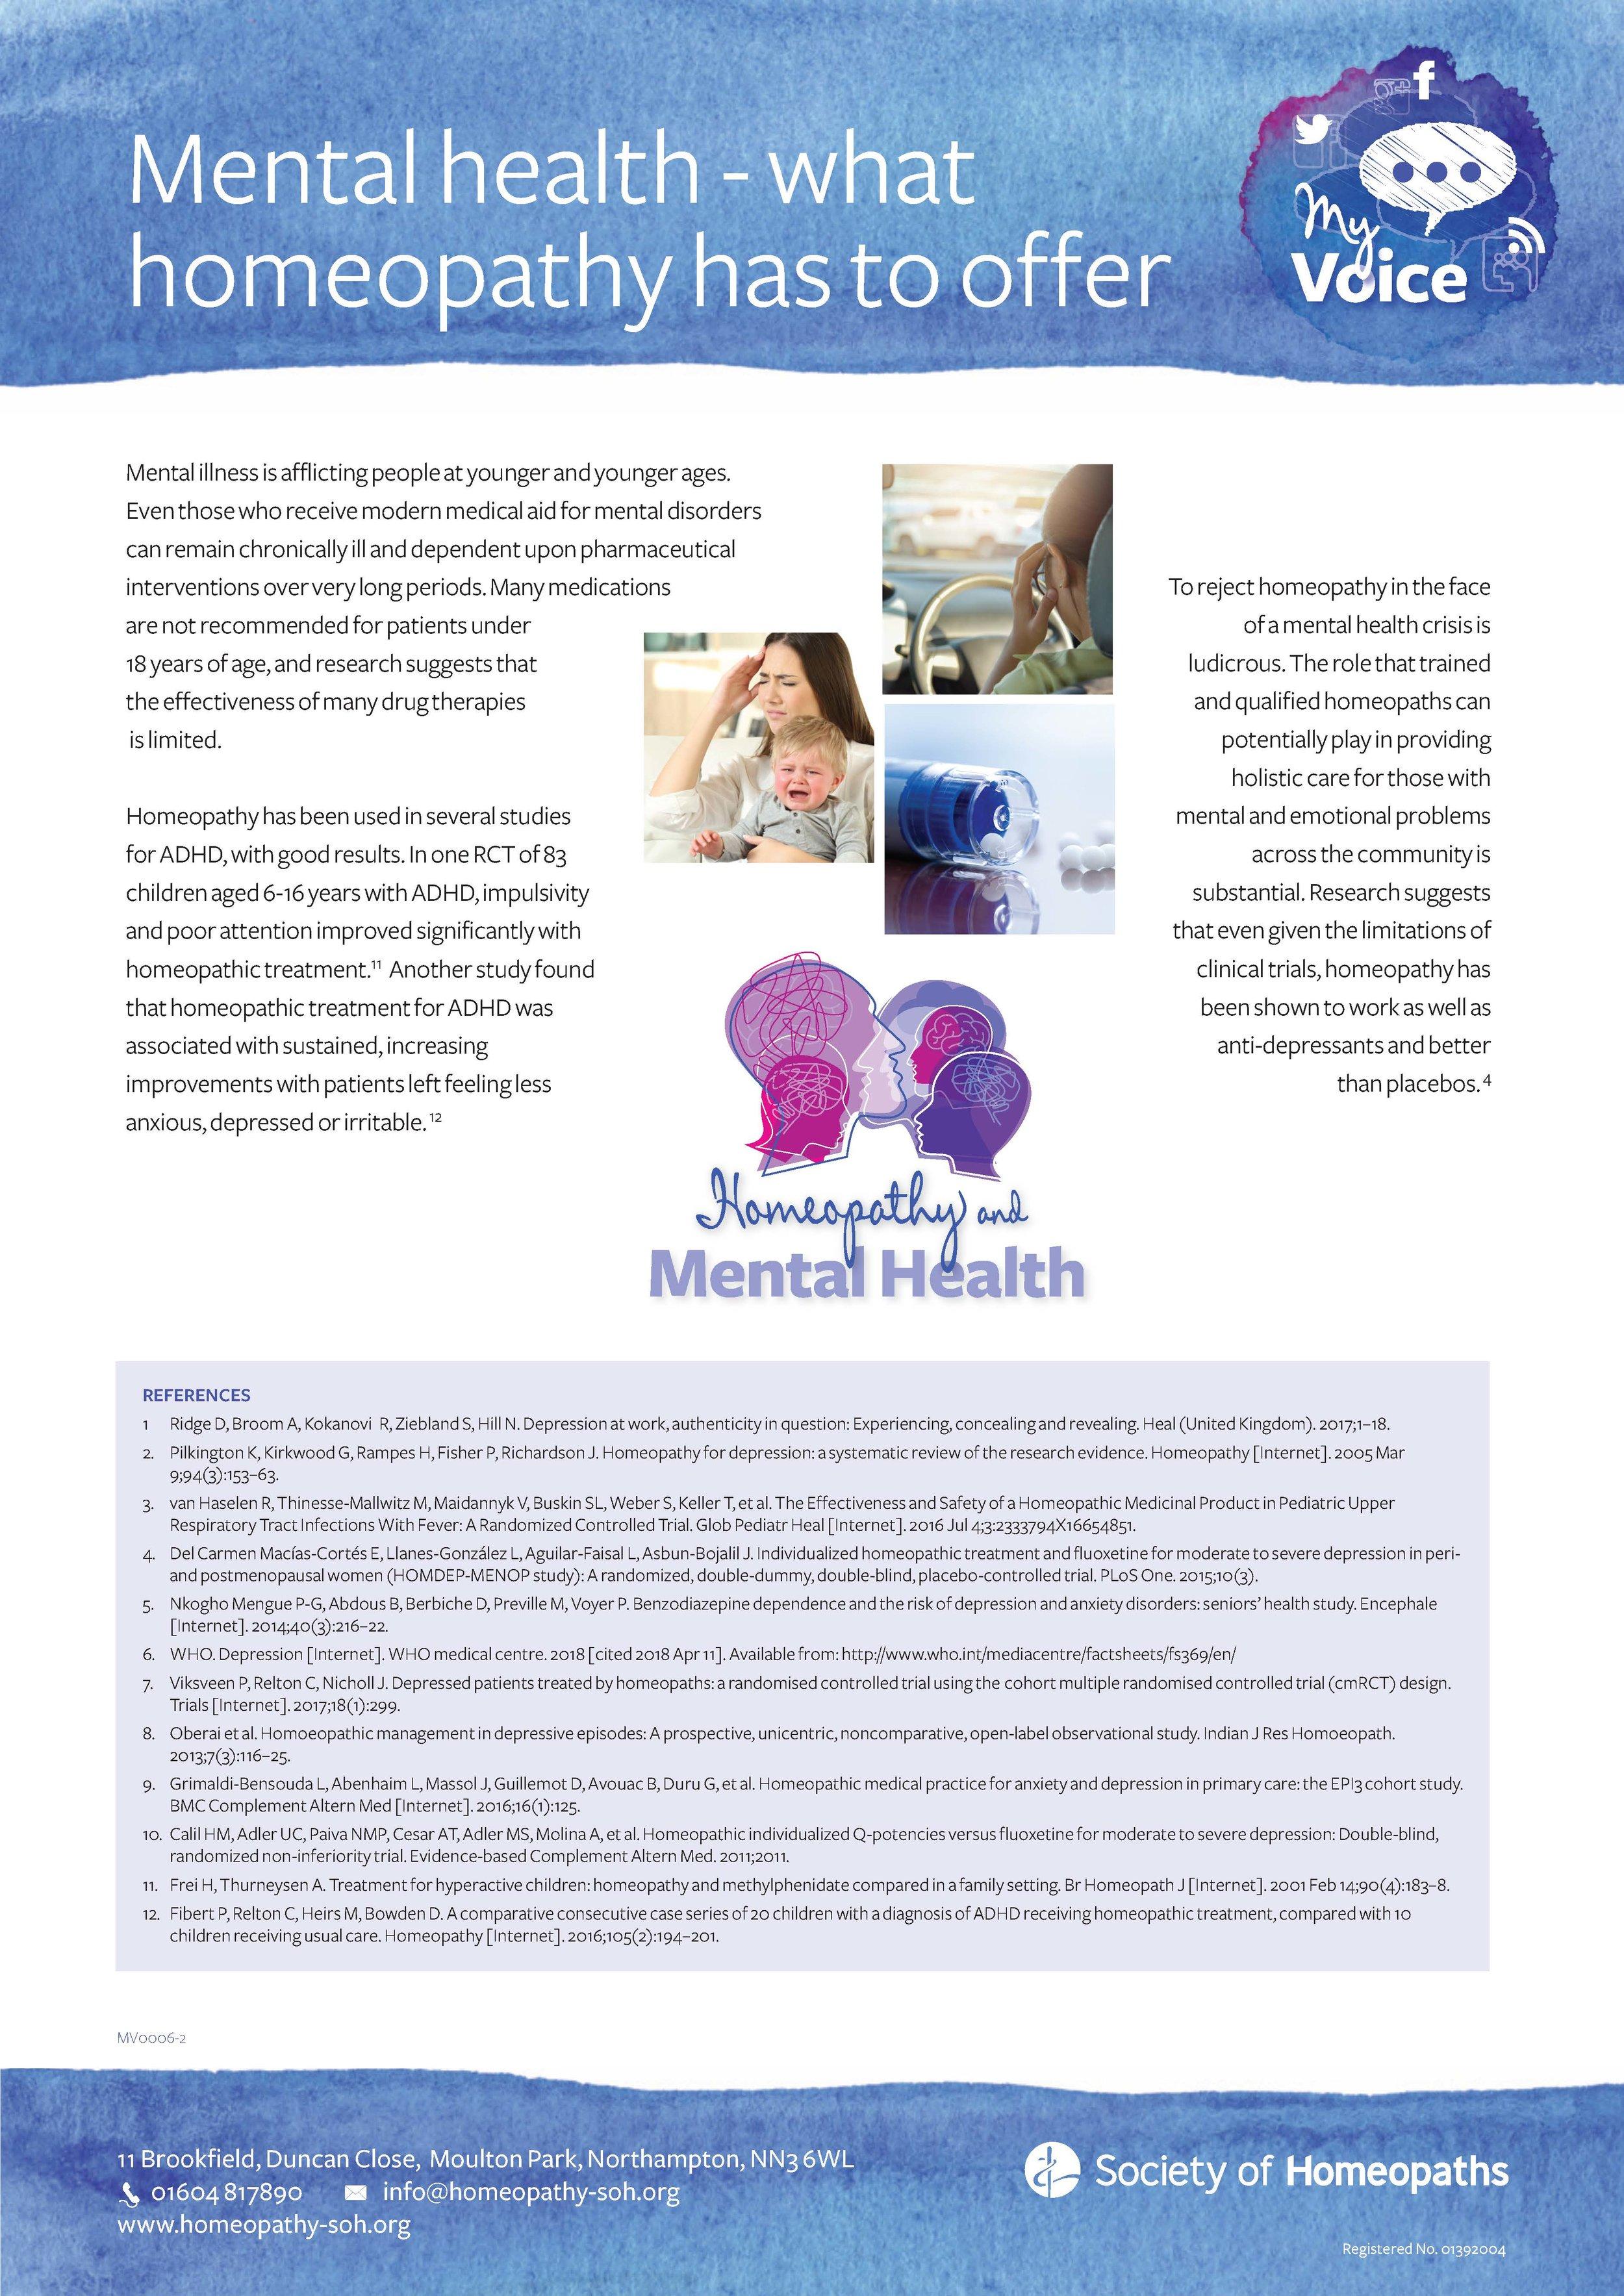 soh_mentalHealth_homeopathy_Page_3.jpg